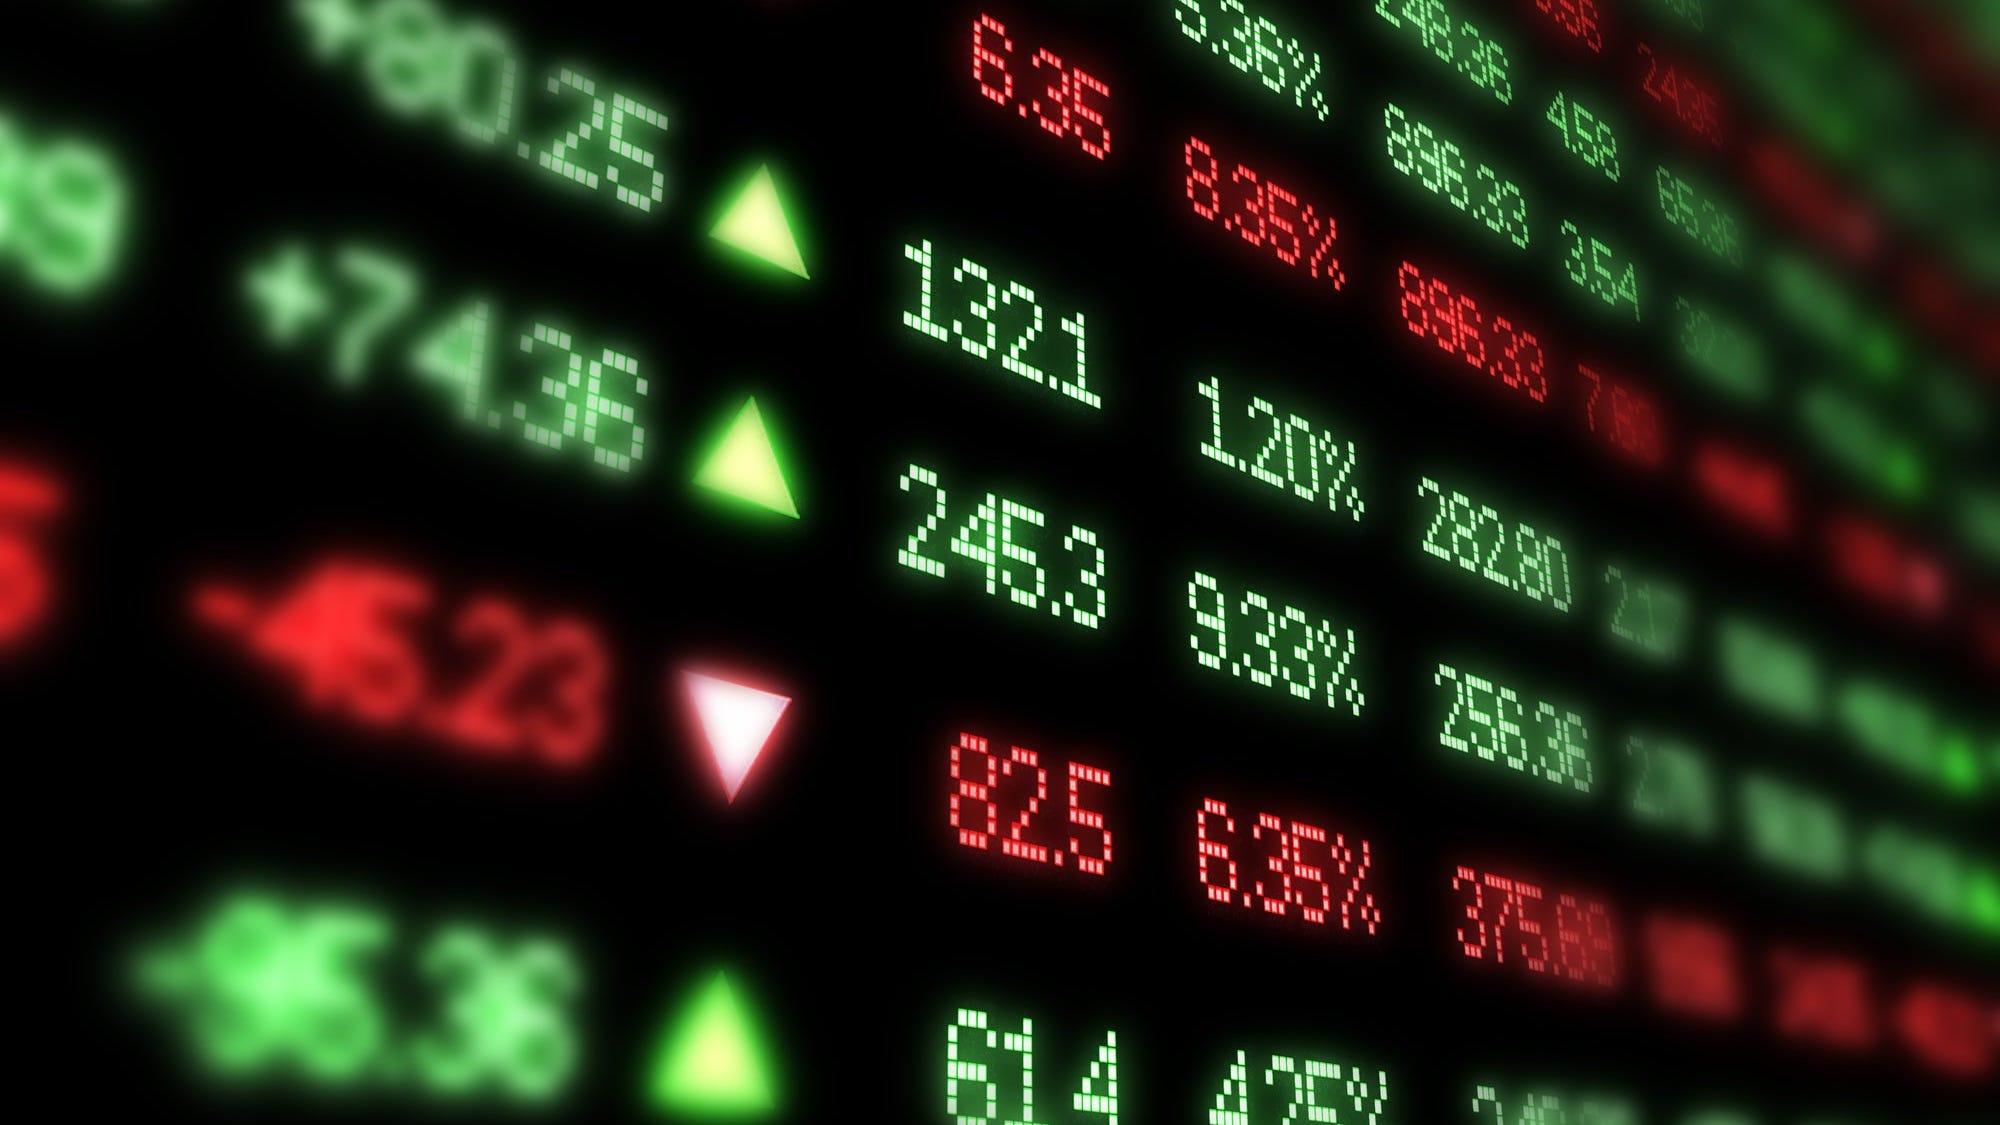 stock-market-image-getty.jpg